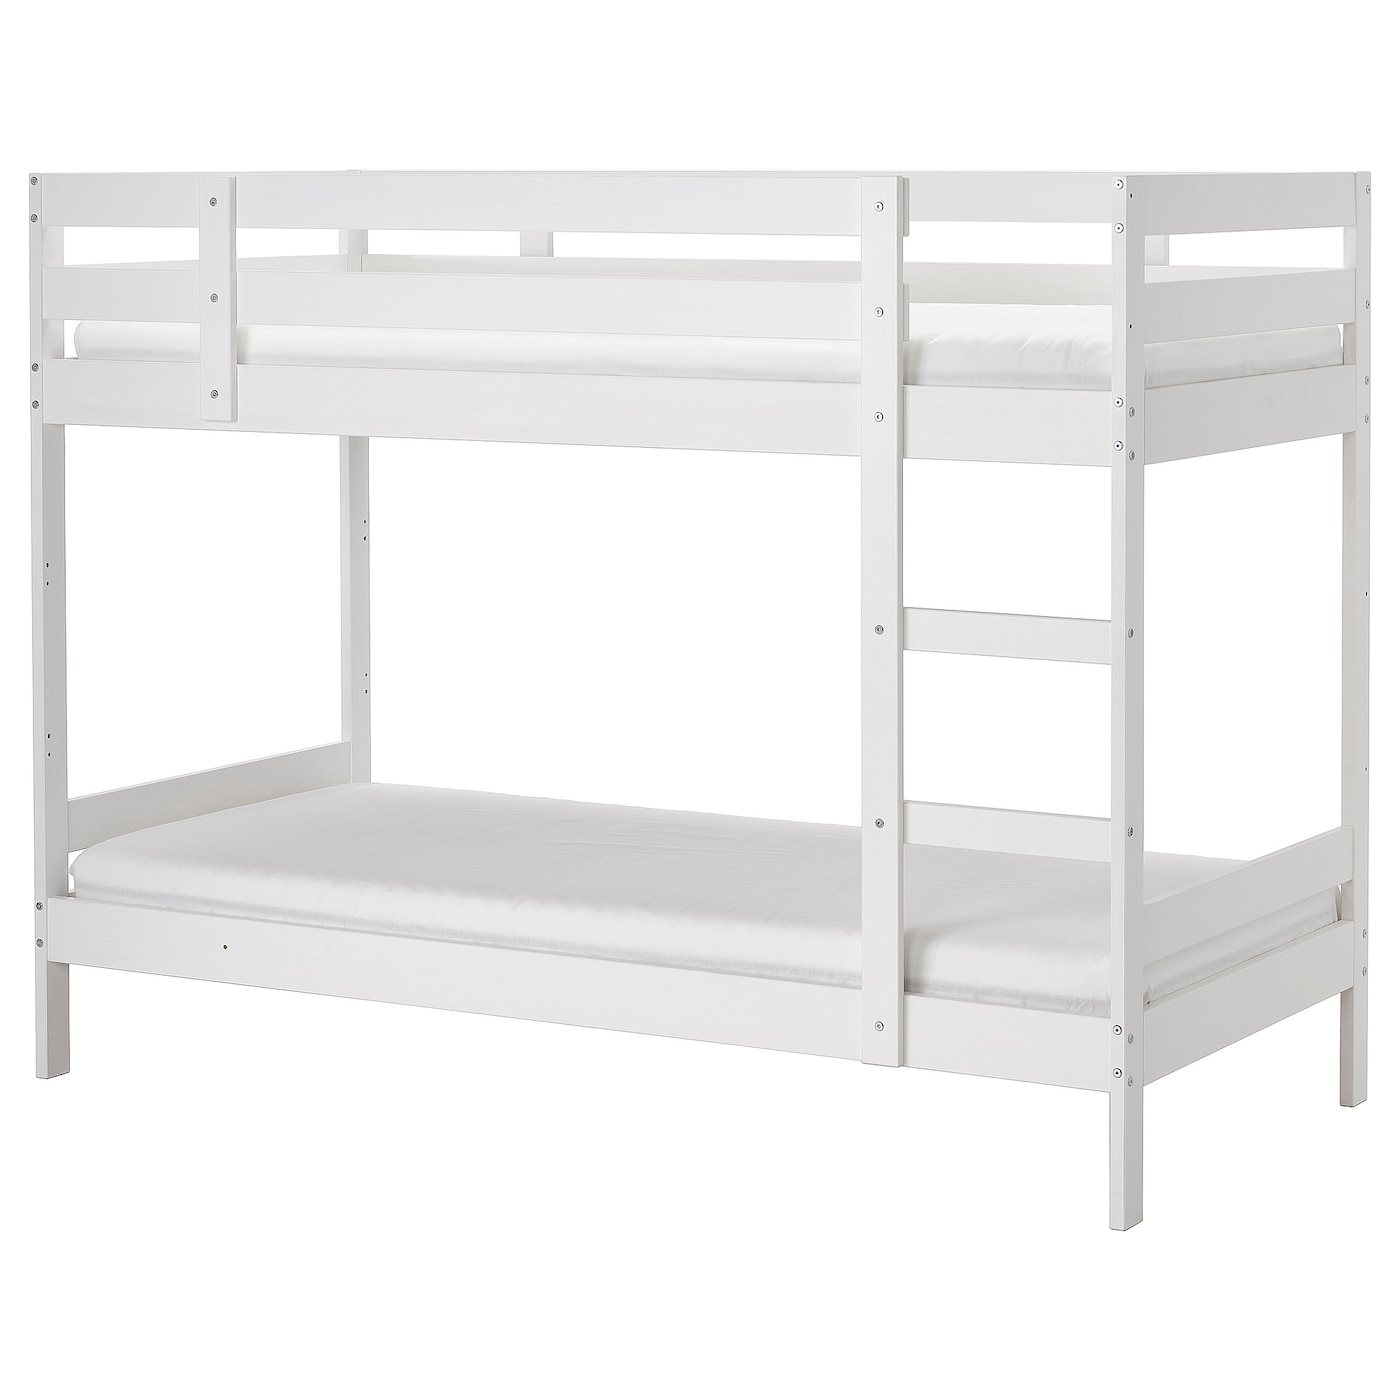 MYDAL Etagenbettgestell - weiß 90x200 cm